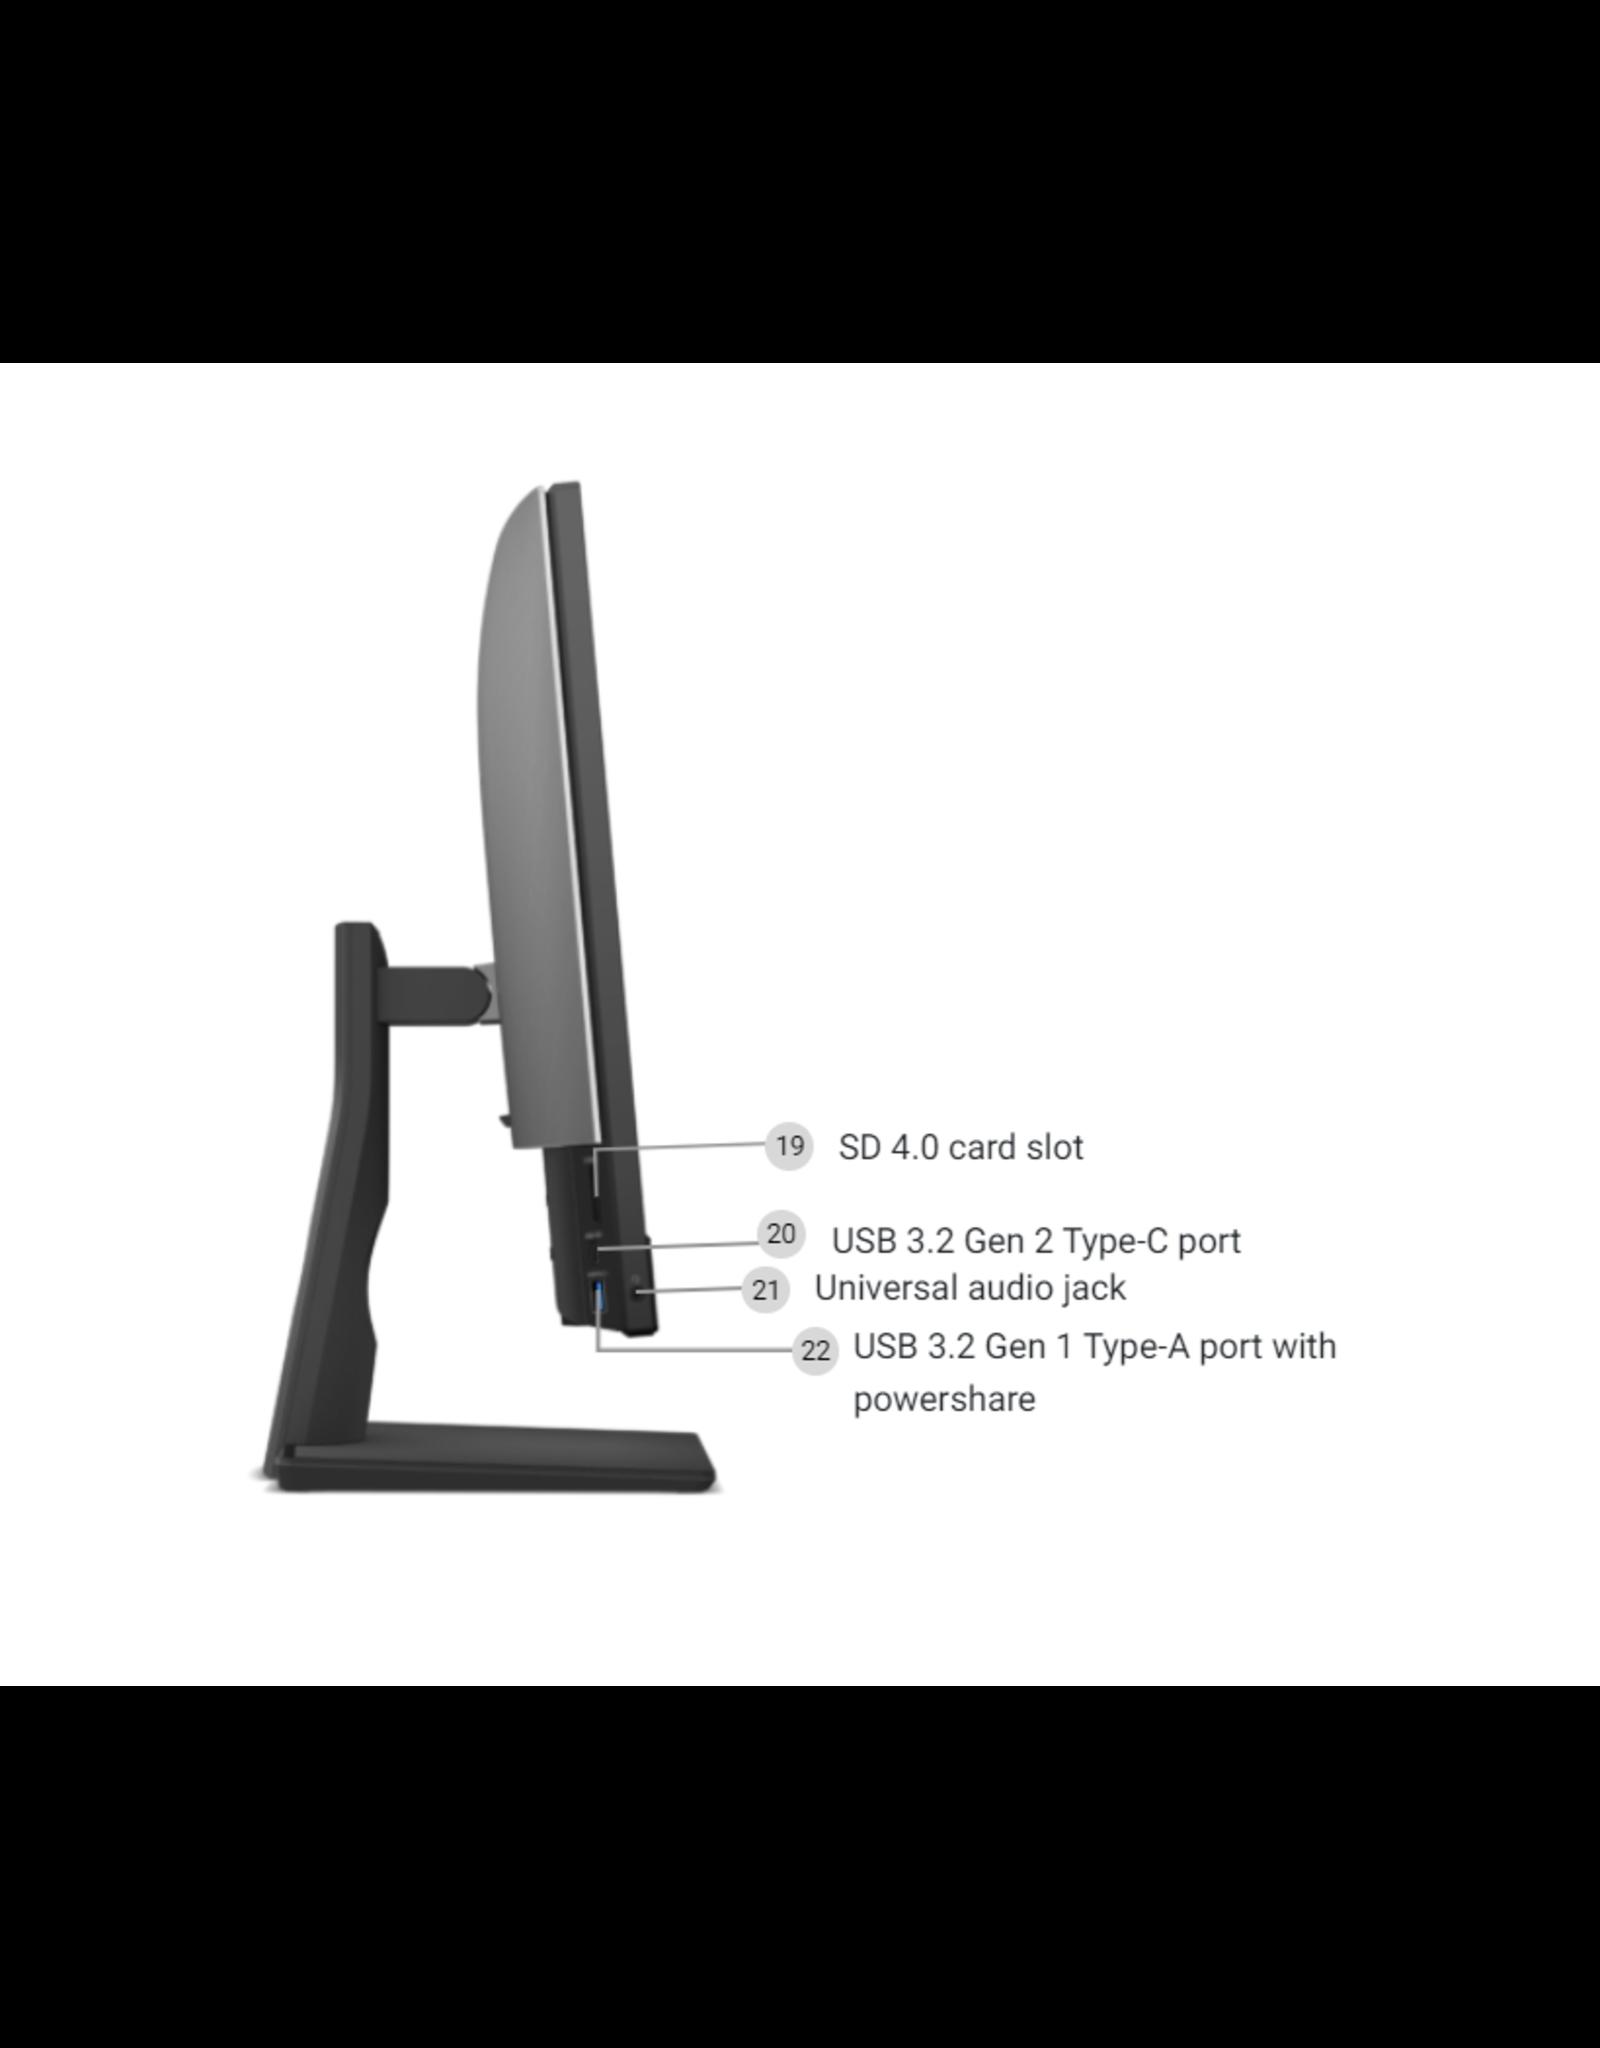 "DELL DELL OPTIPLEX 7480 ALL-N-1: 10TH GEN I7-10700(8-CORE), 16 GB DDR4 RAM, 512GB SSD, 23.8"" FHD (1920x1080) NON-TOUCH ANTI-GLARE CAMERA, INTEL WI-FI, BLUETOOTH, WIRELESS KEYBOARD/MOUSE, 3YR ONSITE/IN-HOME"